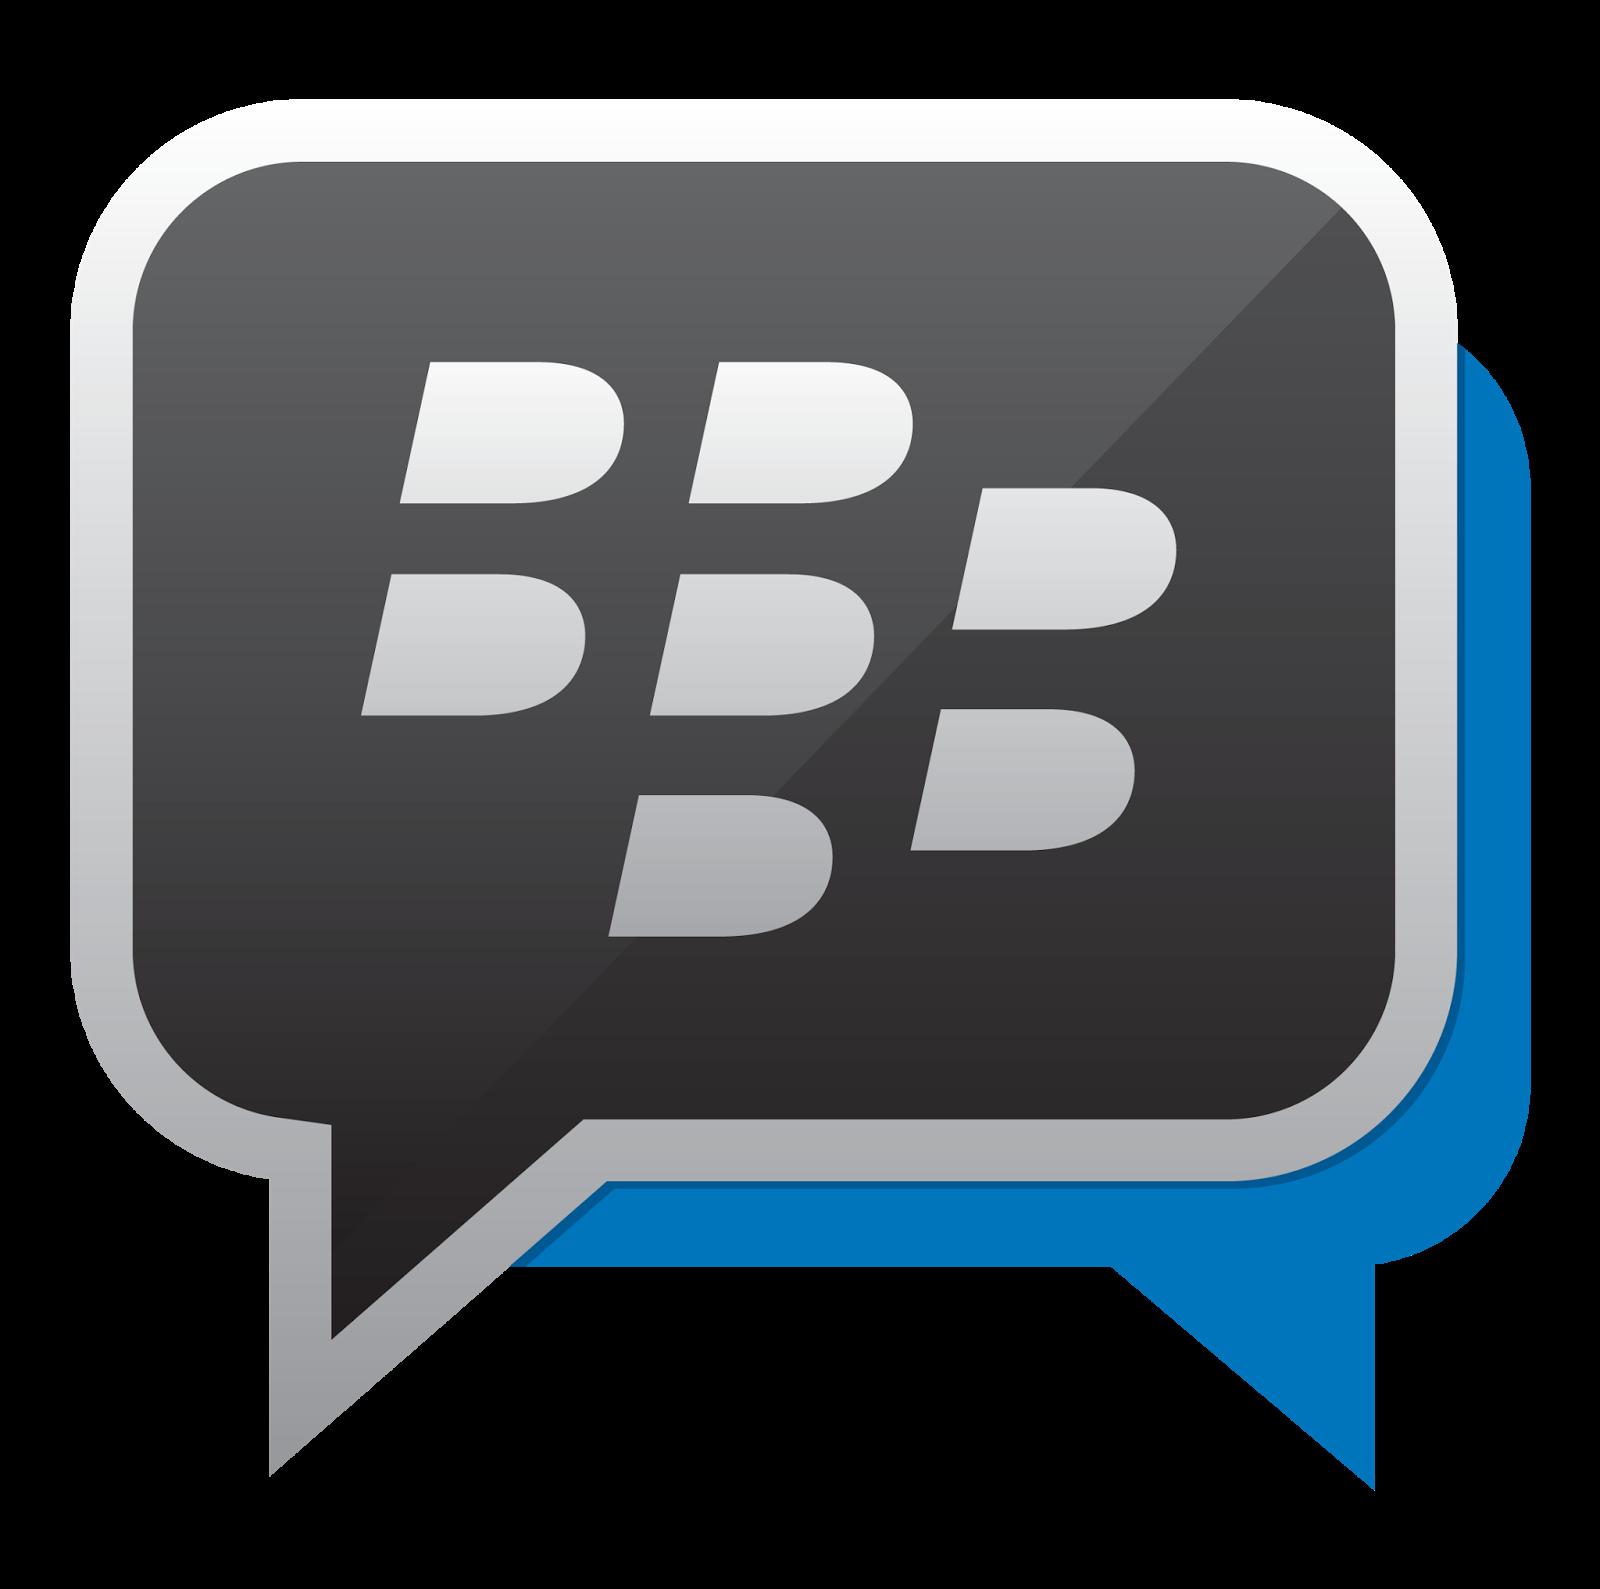 Facebook clipart ocon. Bbm icons png vector